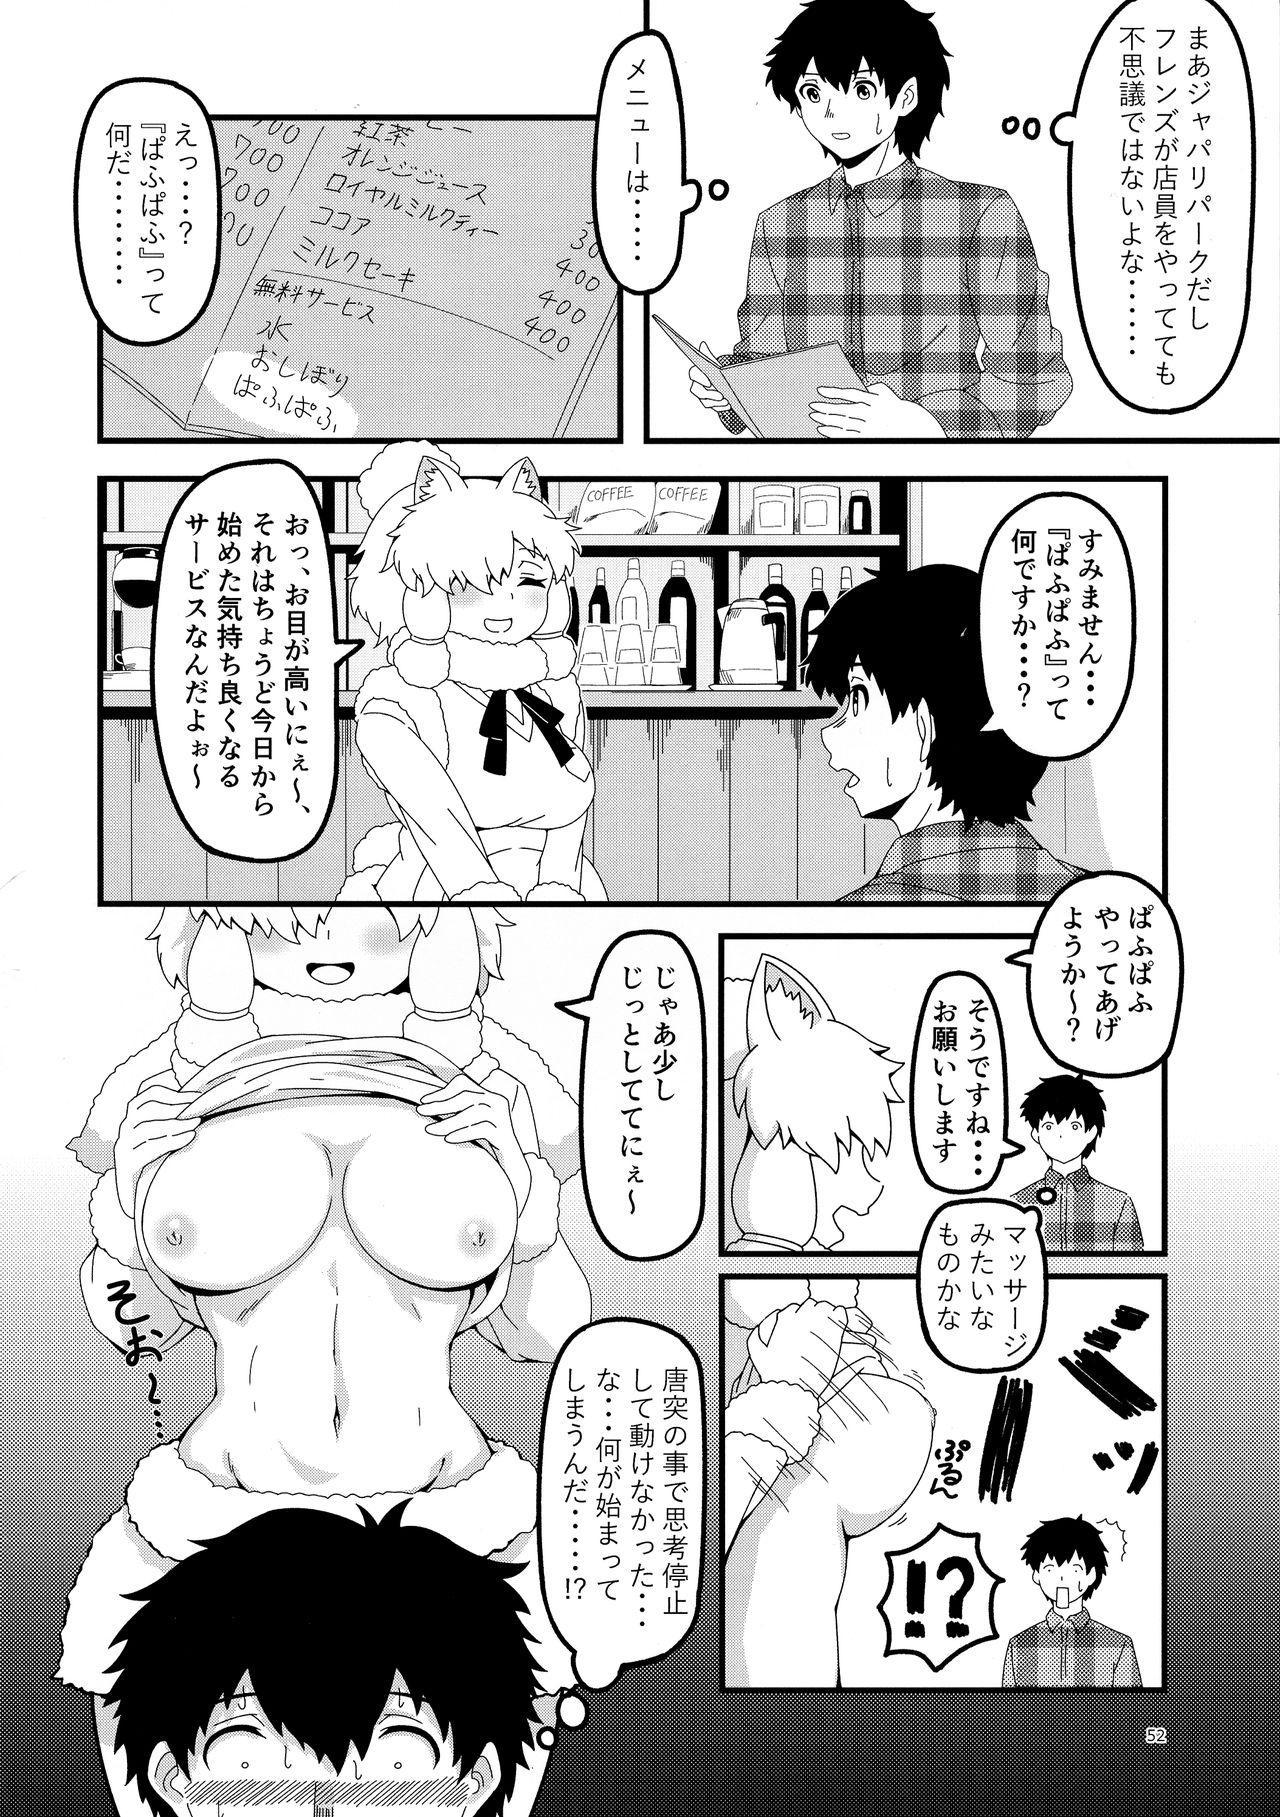 Fuwaaa! Irasshaai! Ura Iyashi no Alpaca-san Goudou 51